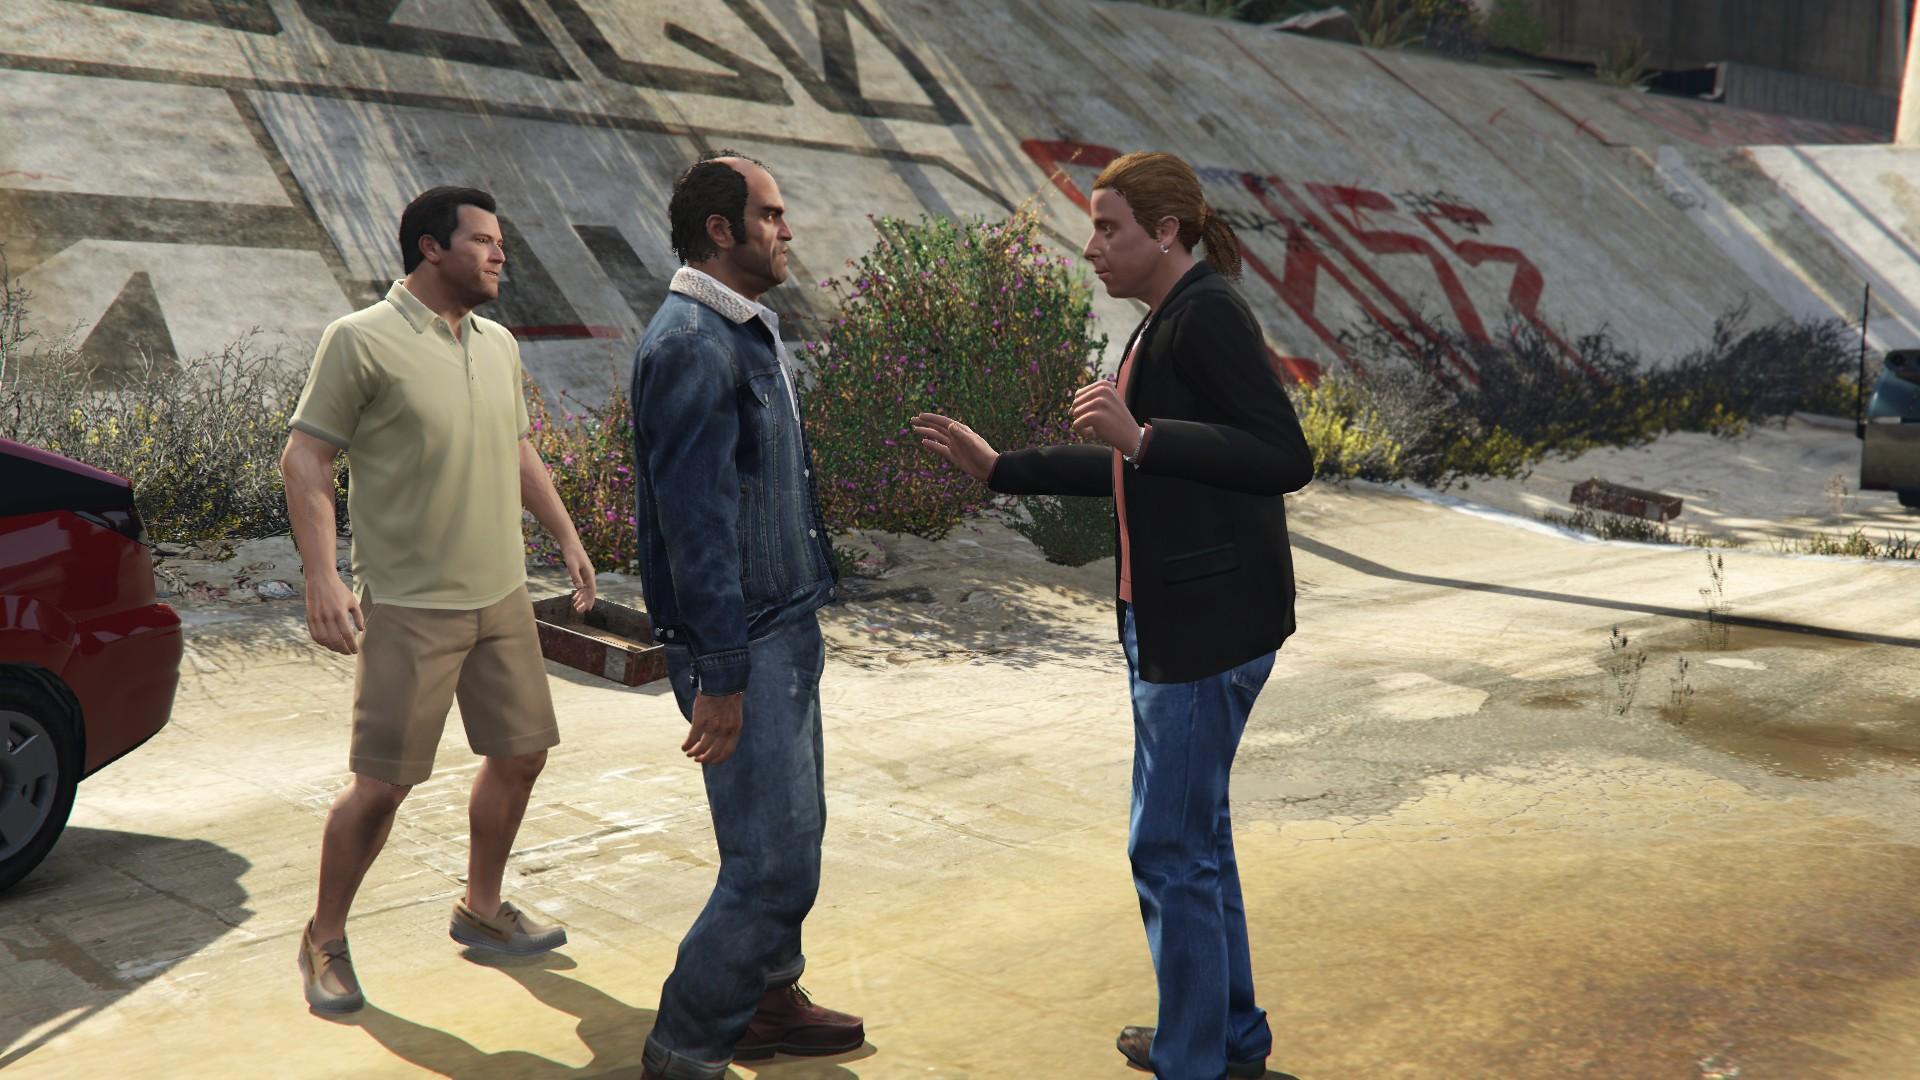 21379321982_26f47041b9_k.jpg - Grand Theft Auto 5